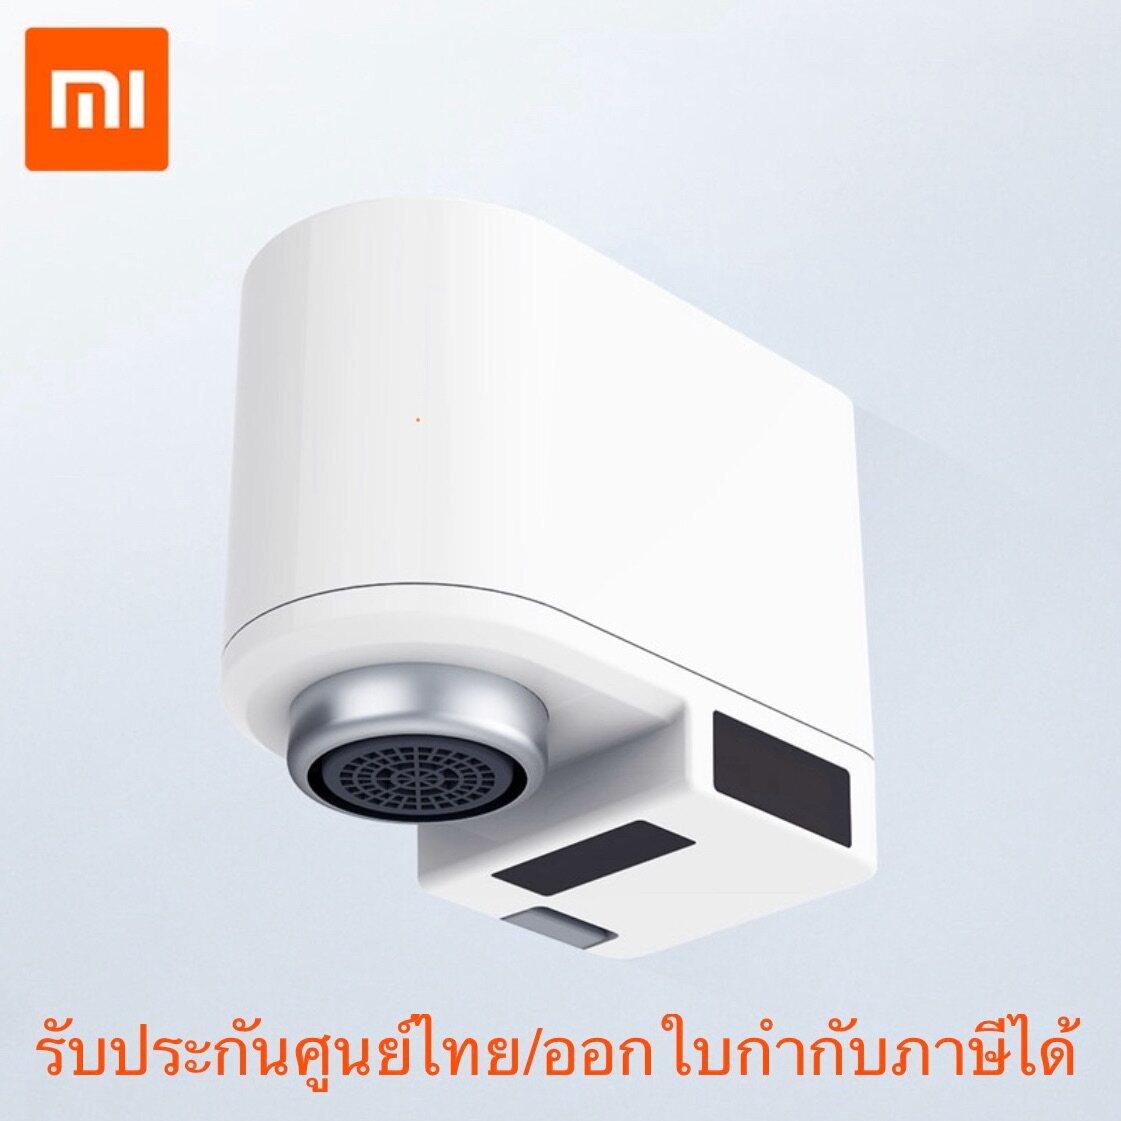 Xiaomi Youpin Automatic Infrared Induction Sensor Water Saving Device ที่สวมหัวก๊อกน้ำ หัวก๊อกน้ำอินฟาเรดเซนเซอร์(พร้อมส่ง-ส่งฟรี)